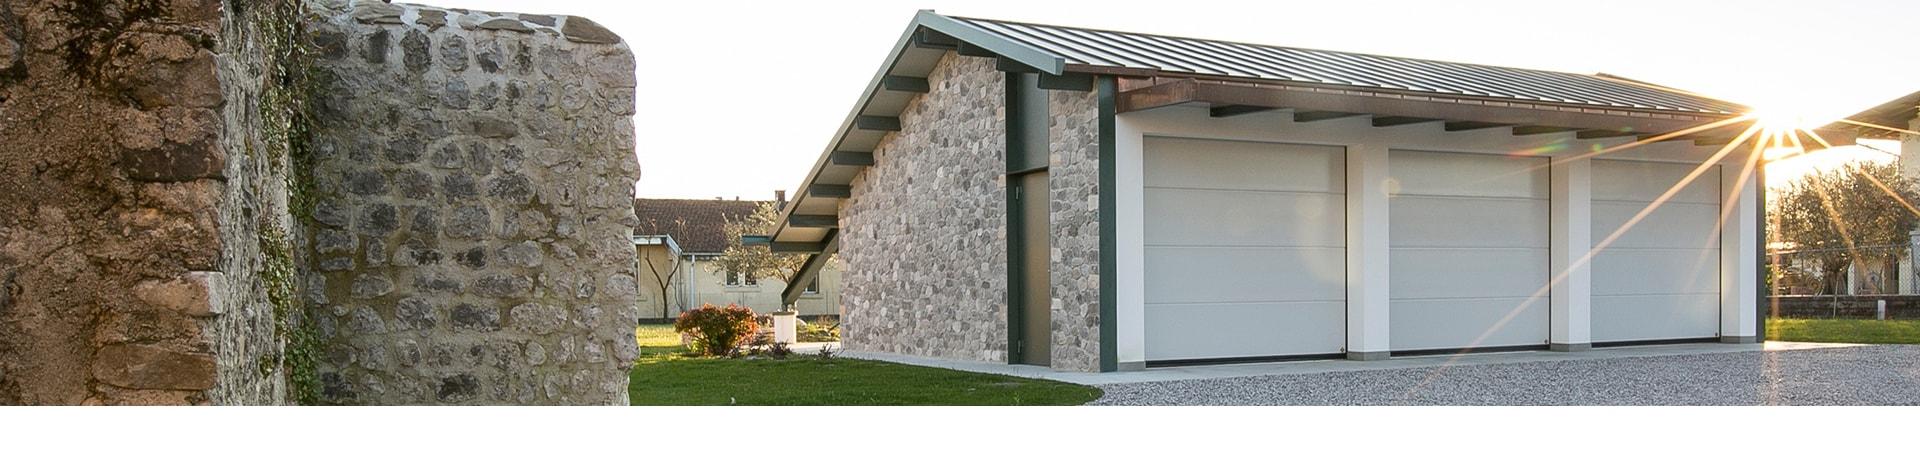 Portoni Sezionali da garages